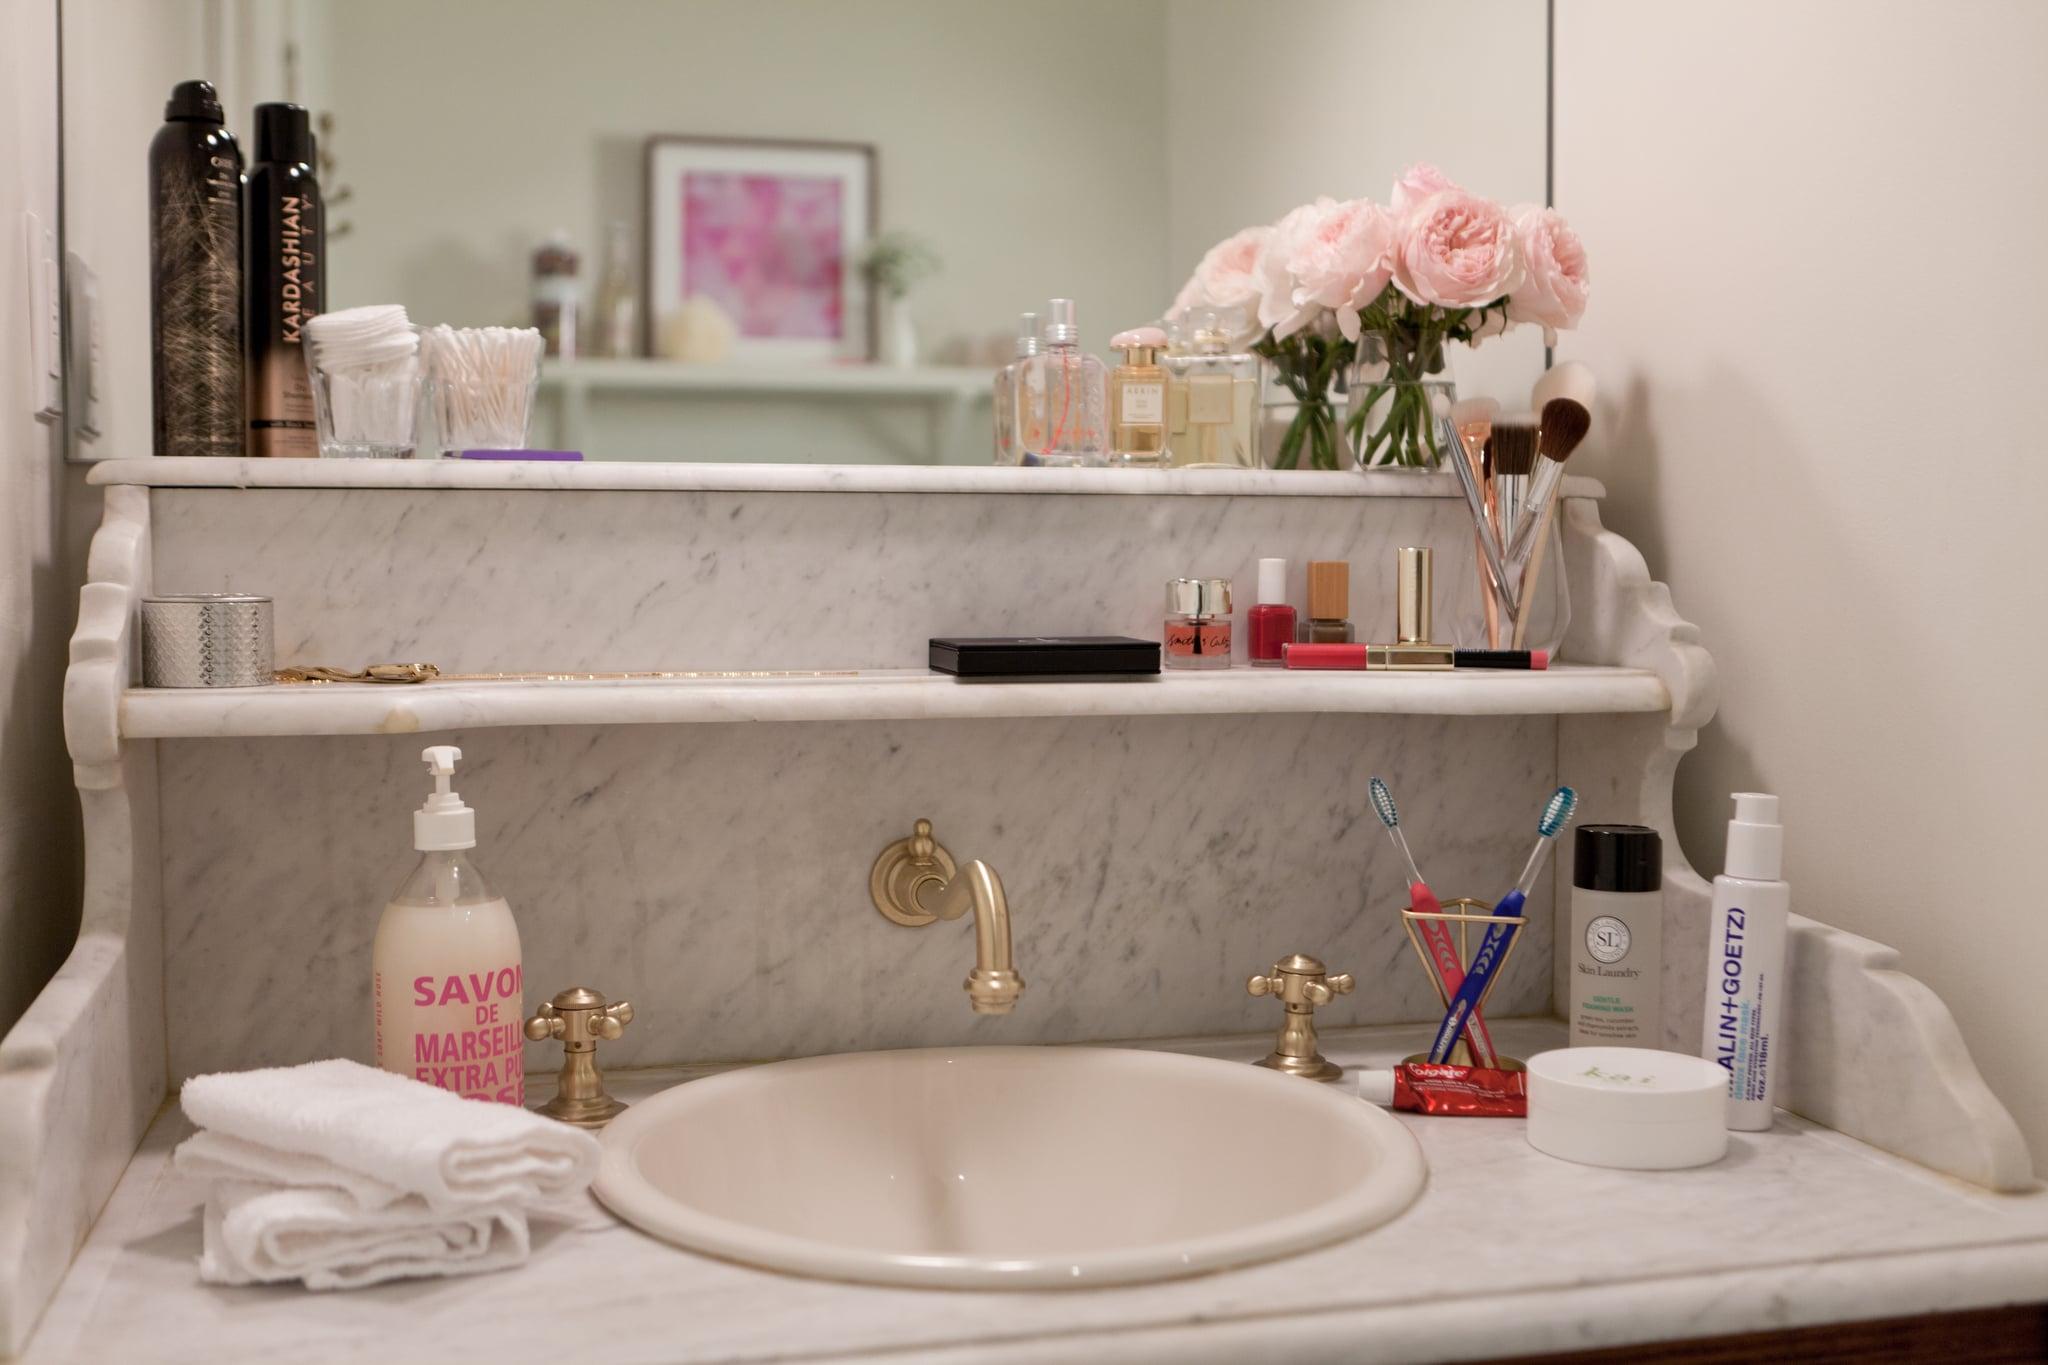 How To Organize The Bathroom Popsugar Middle East Smart Living